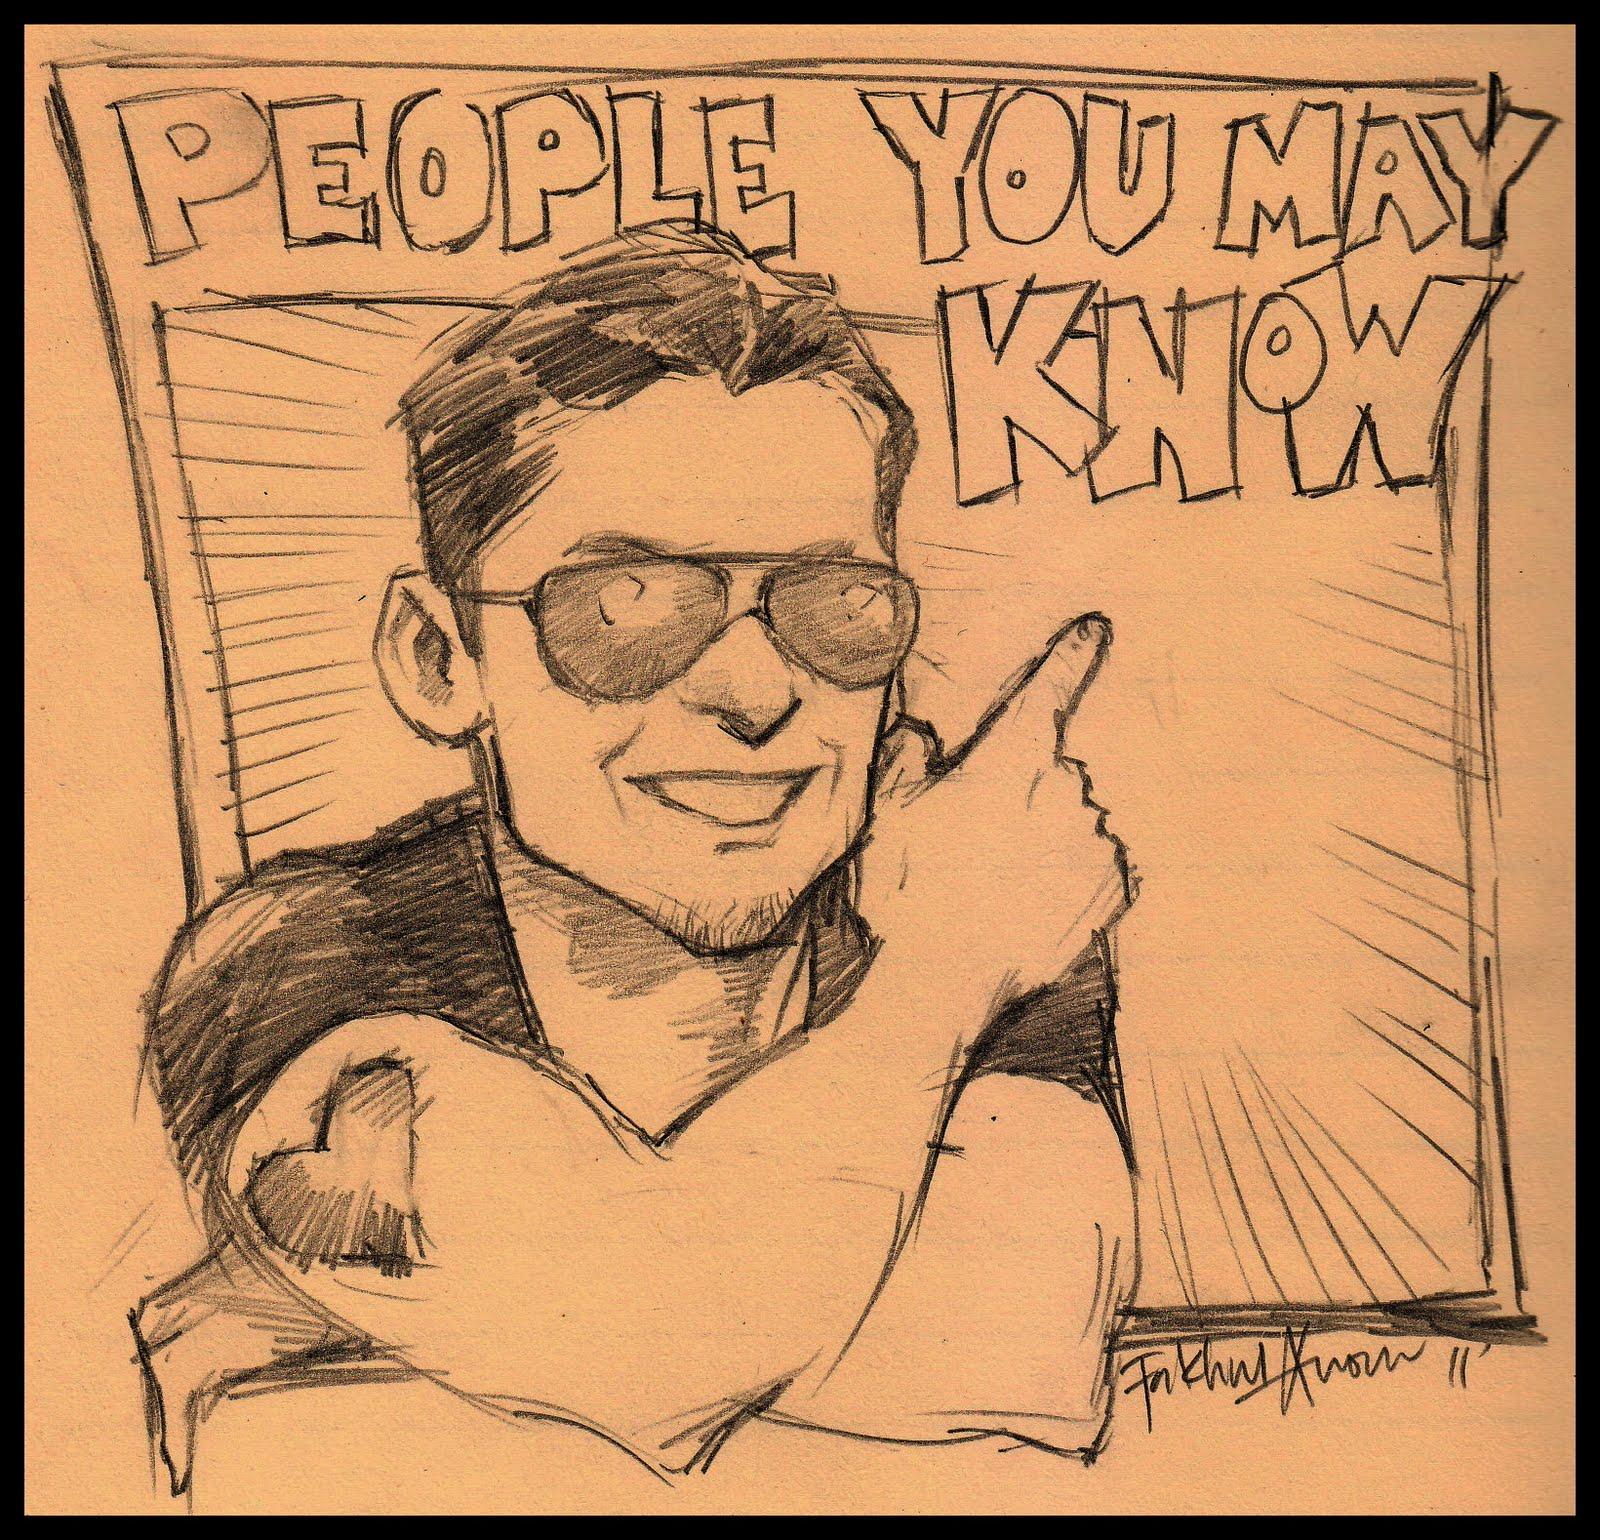 Tara Lak To Lagda Khari Di: IN THE MIND OF A COMIC ARTIST: OH EDIE!!! [FB: PEOPLE YOU